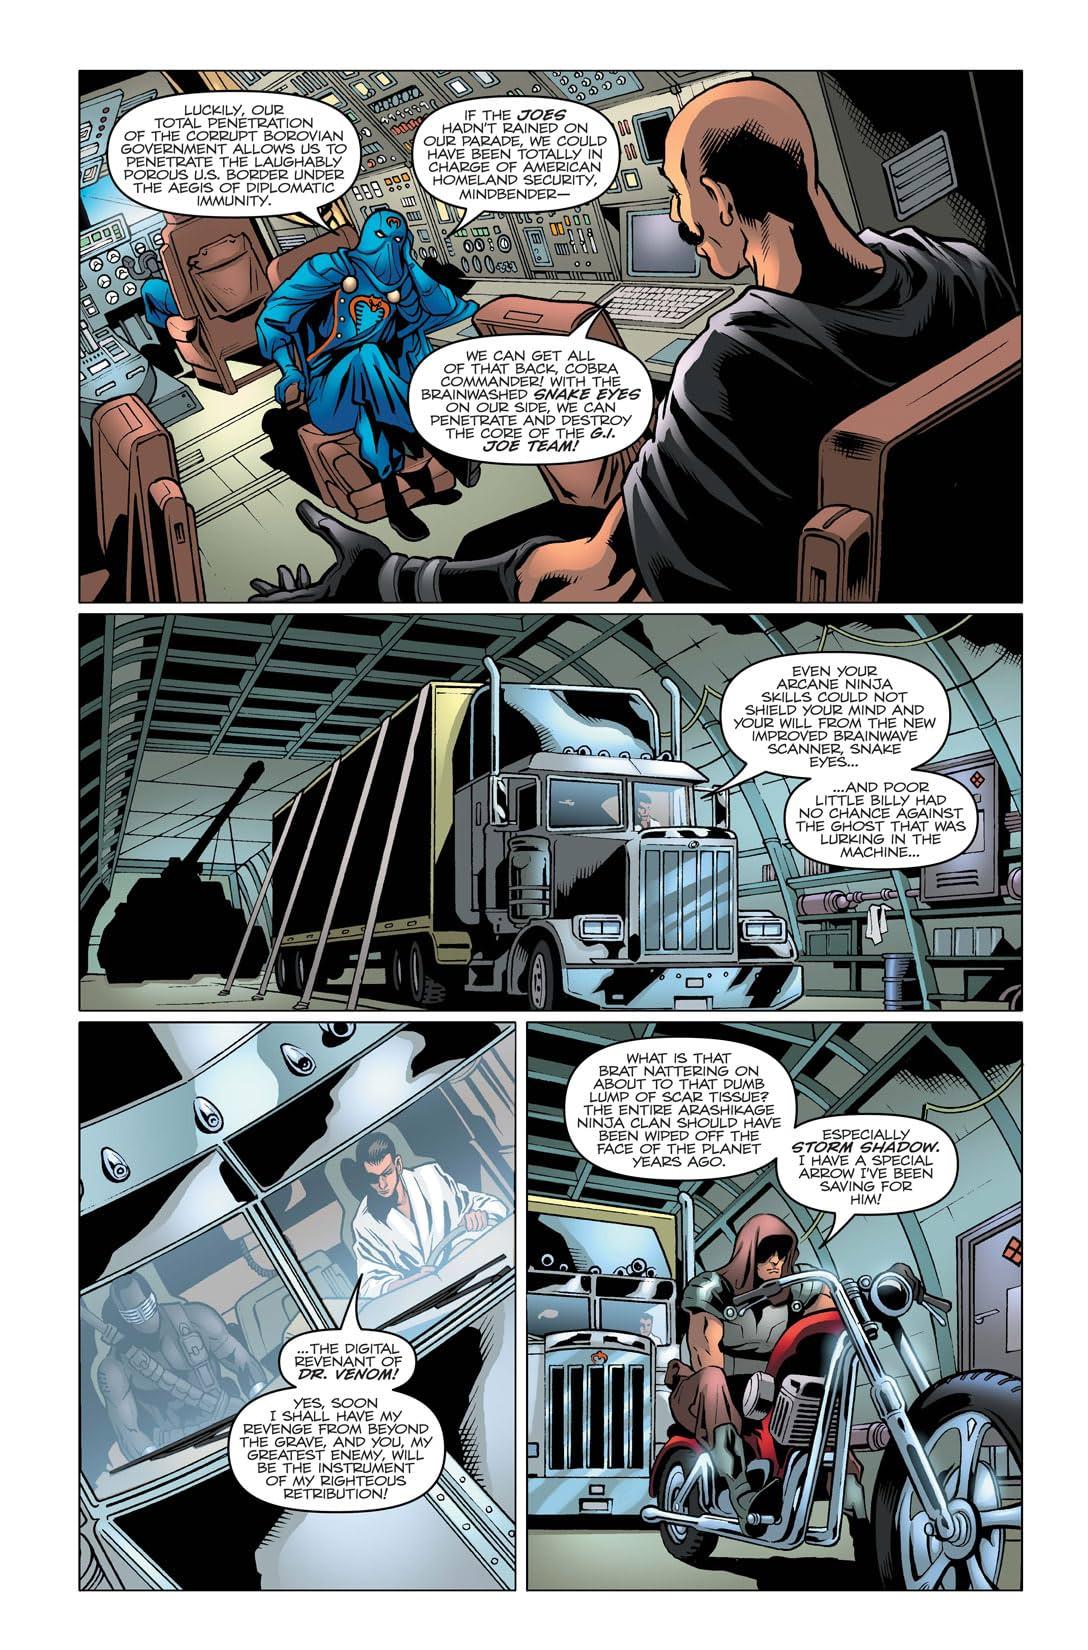 G.I. Joe: A Real American Hero No.162